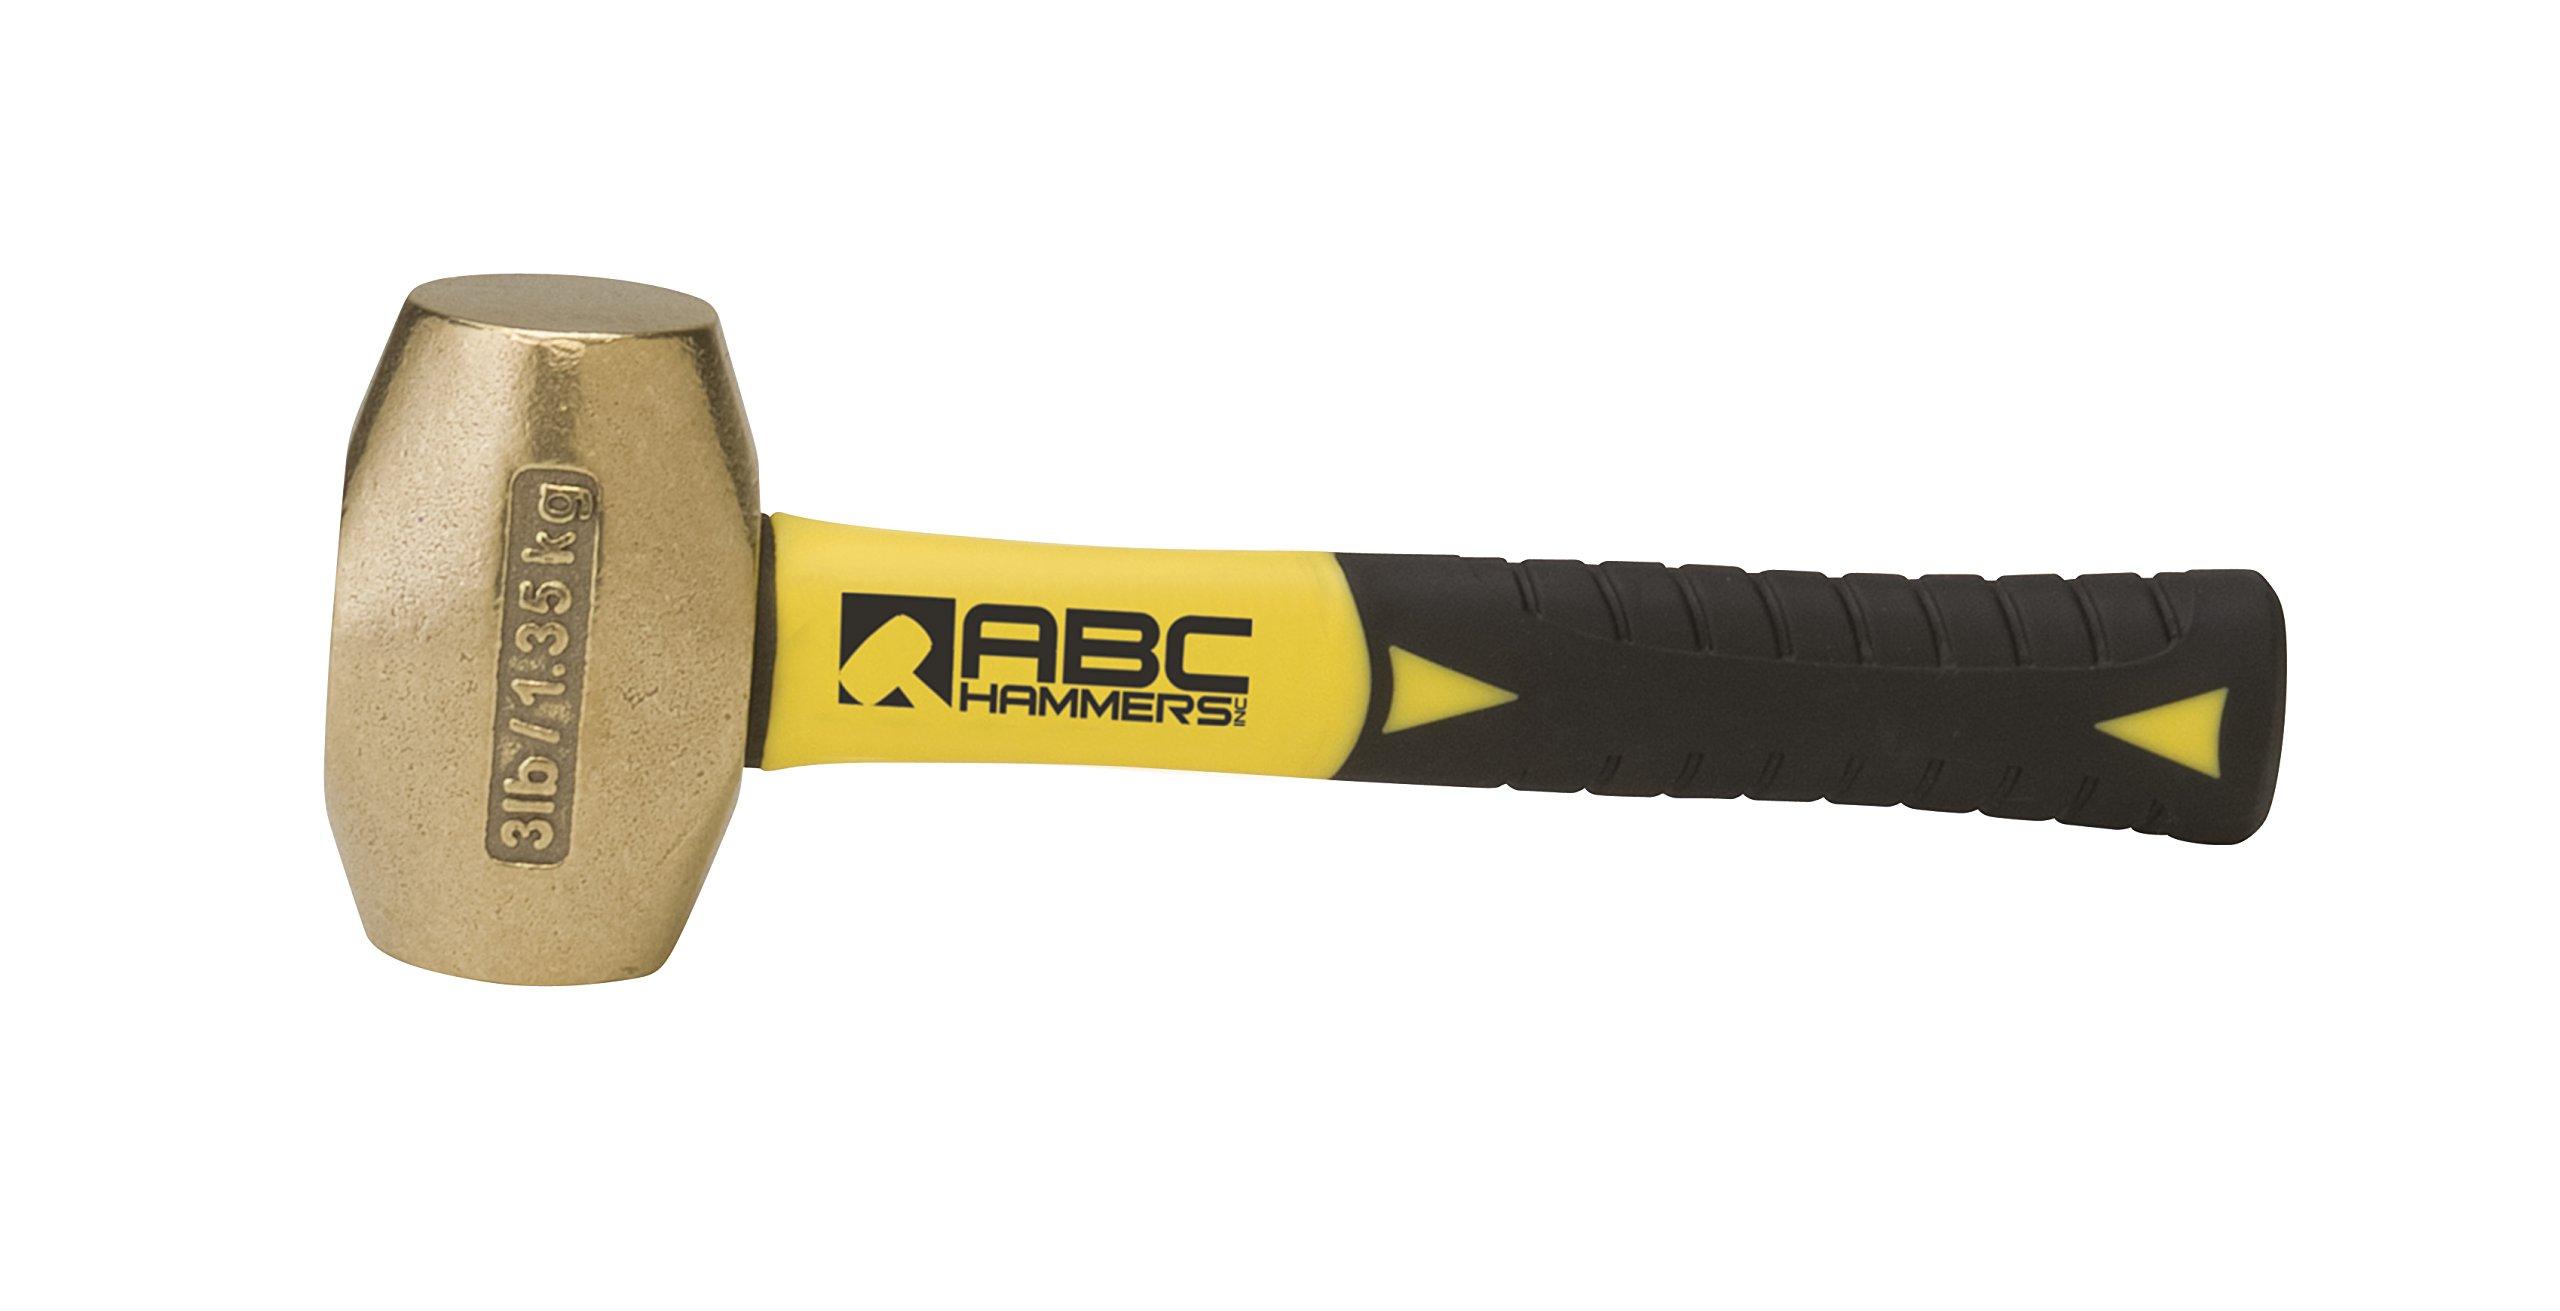 ABC Hammers ABC3BFS Brass Hammer with 8-Inch Fiberglass Handle, 3-Pound